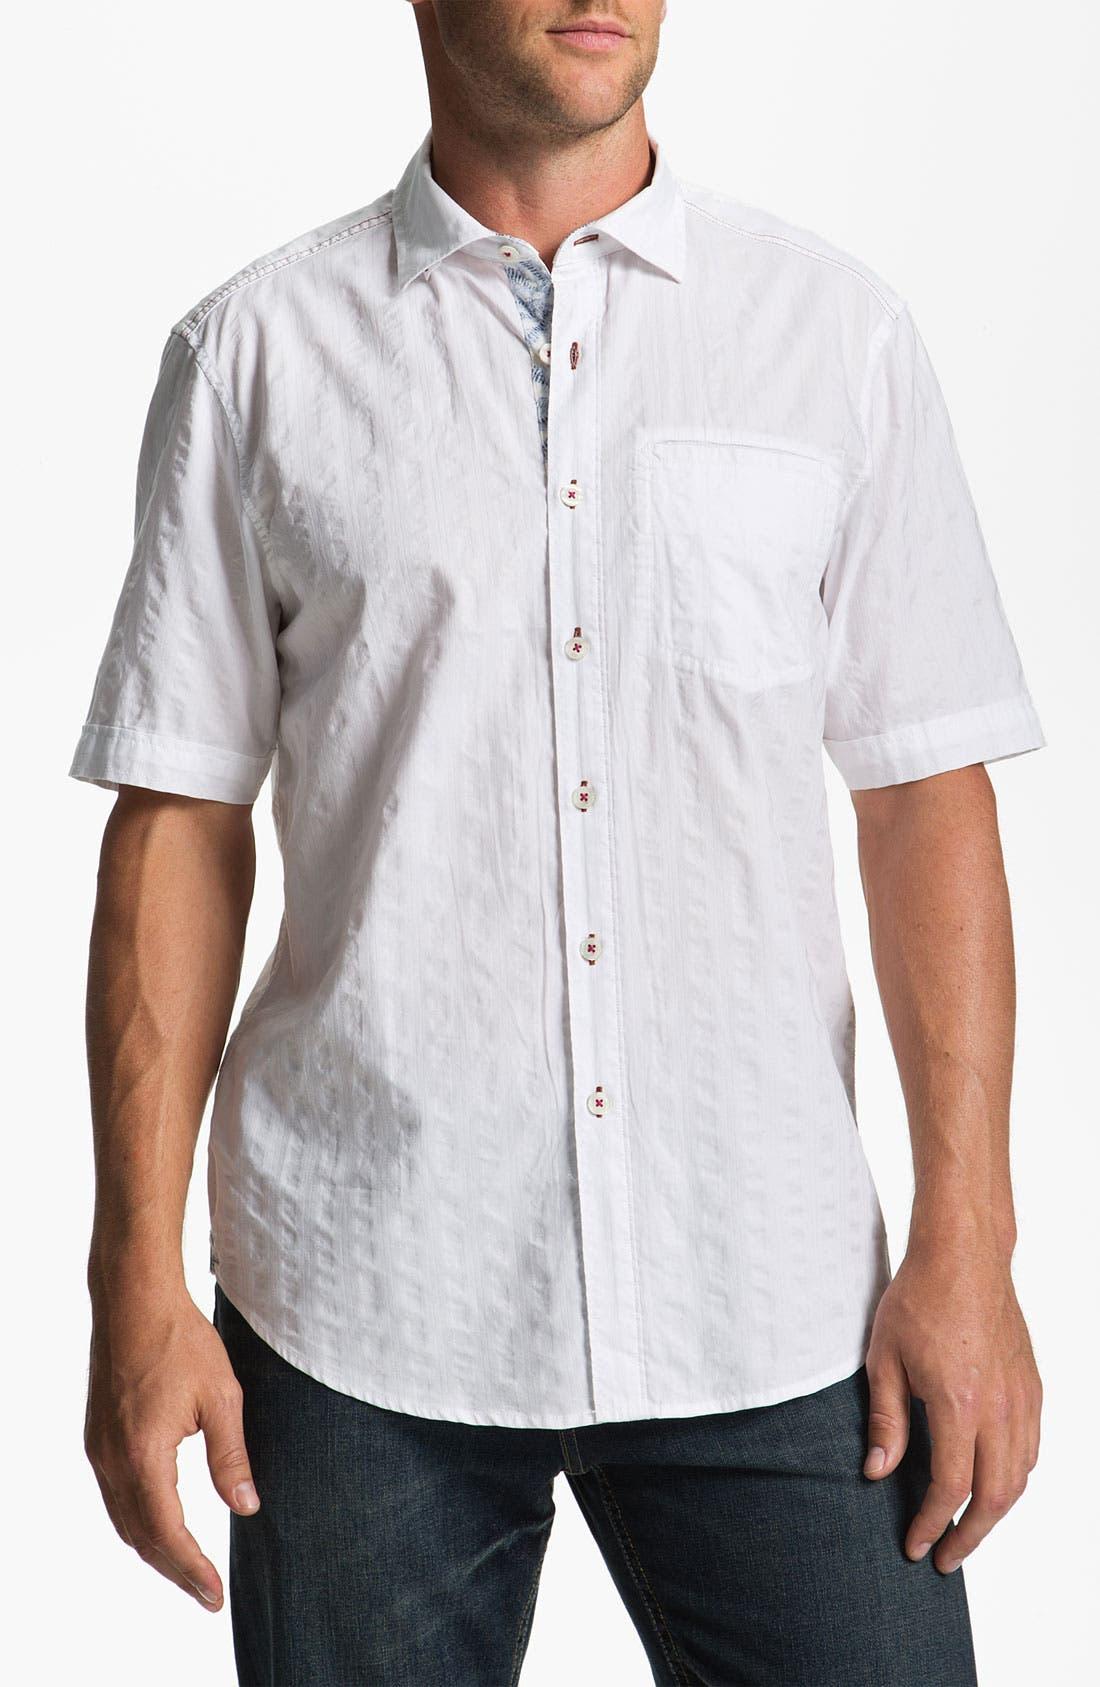 Alternate Image 1 Selected - Tommy Bahama 'White Stripe' Sport Shirt